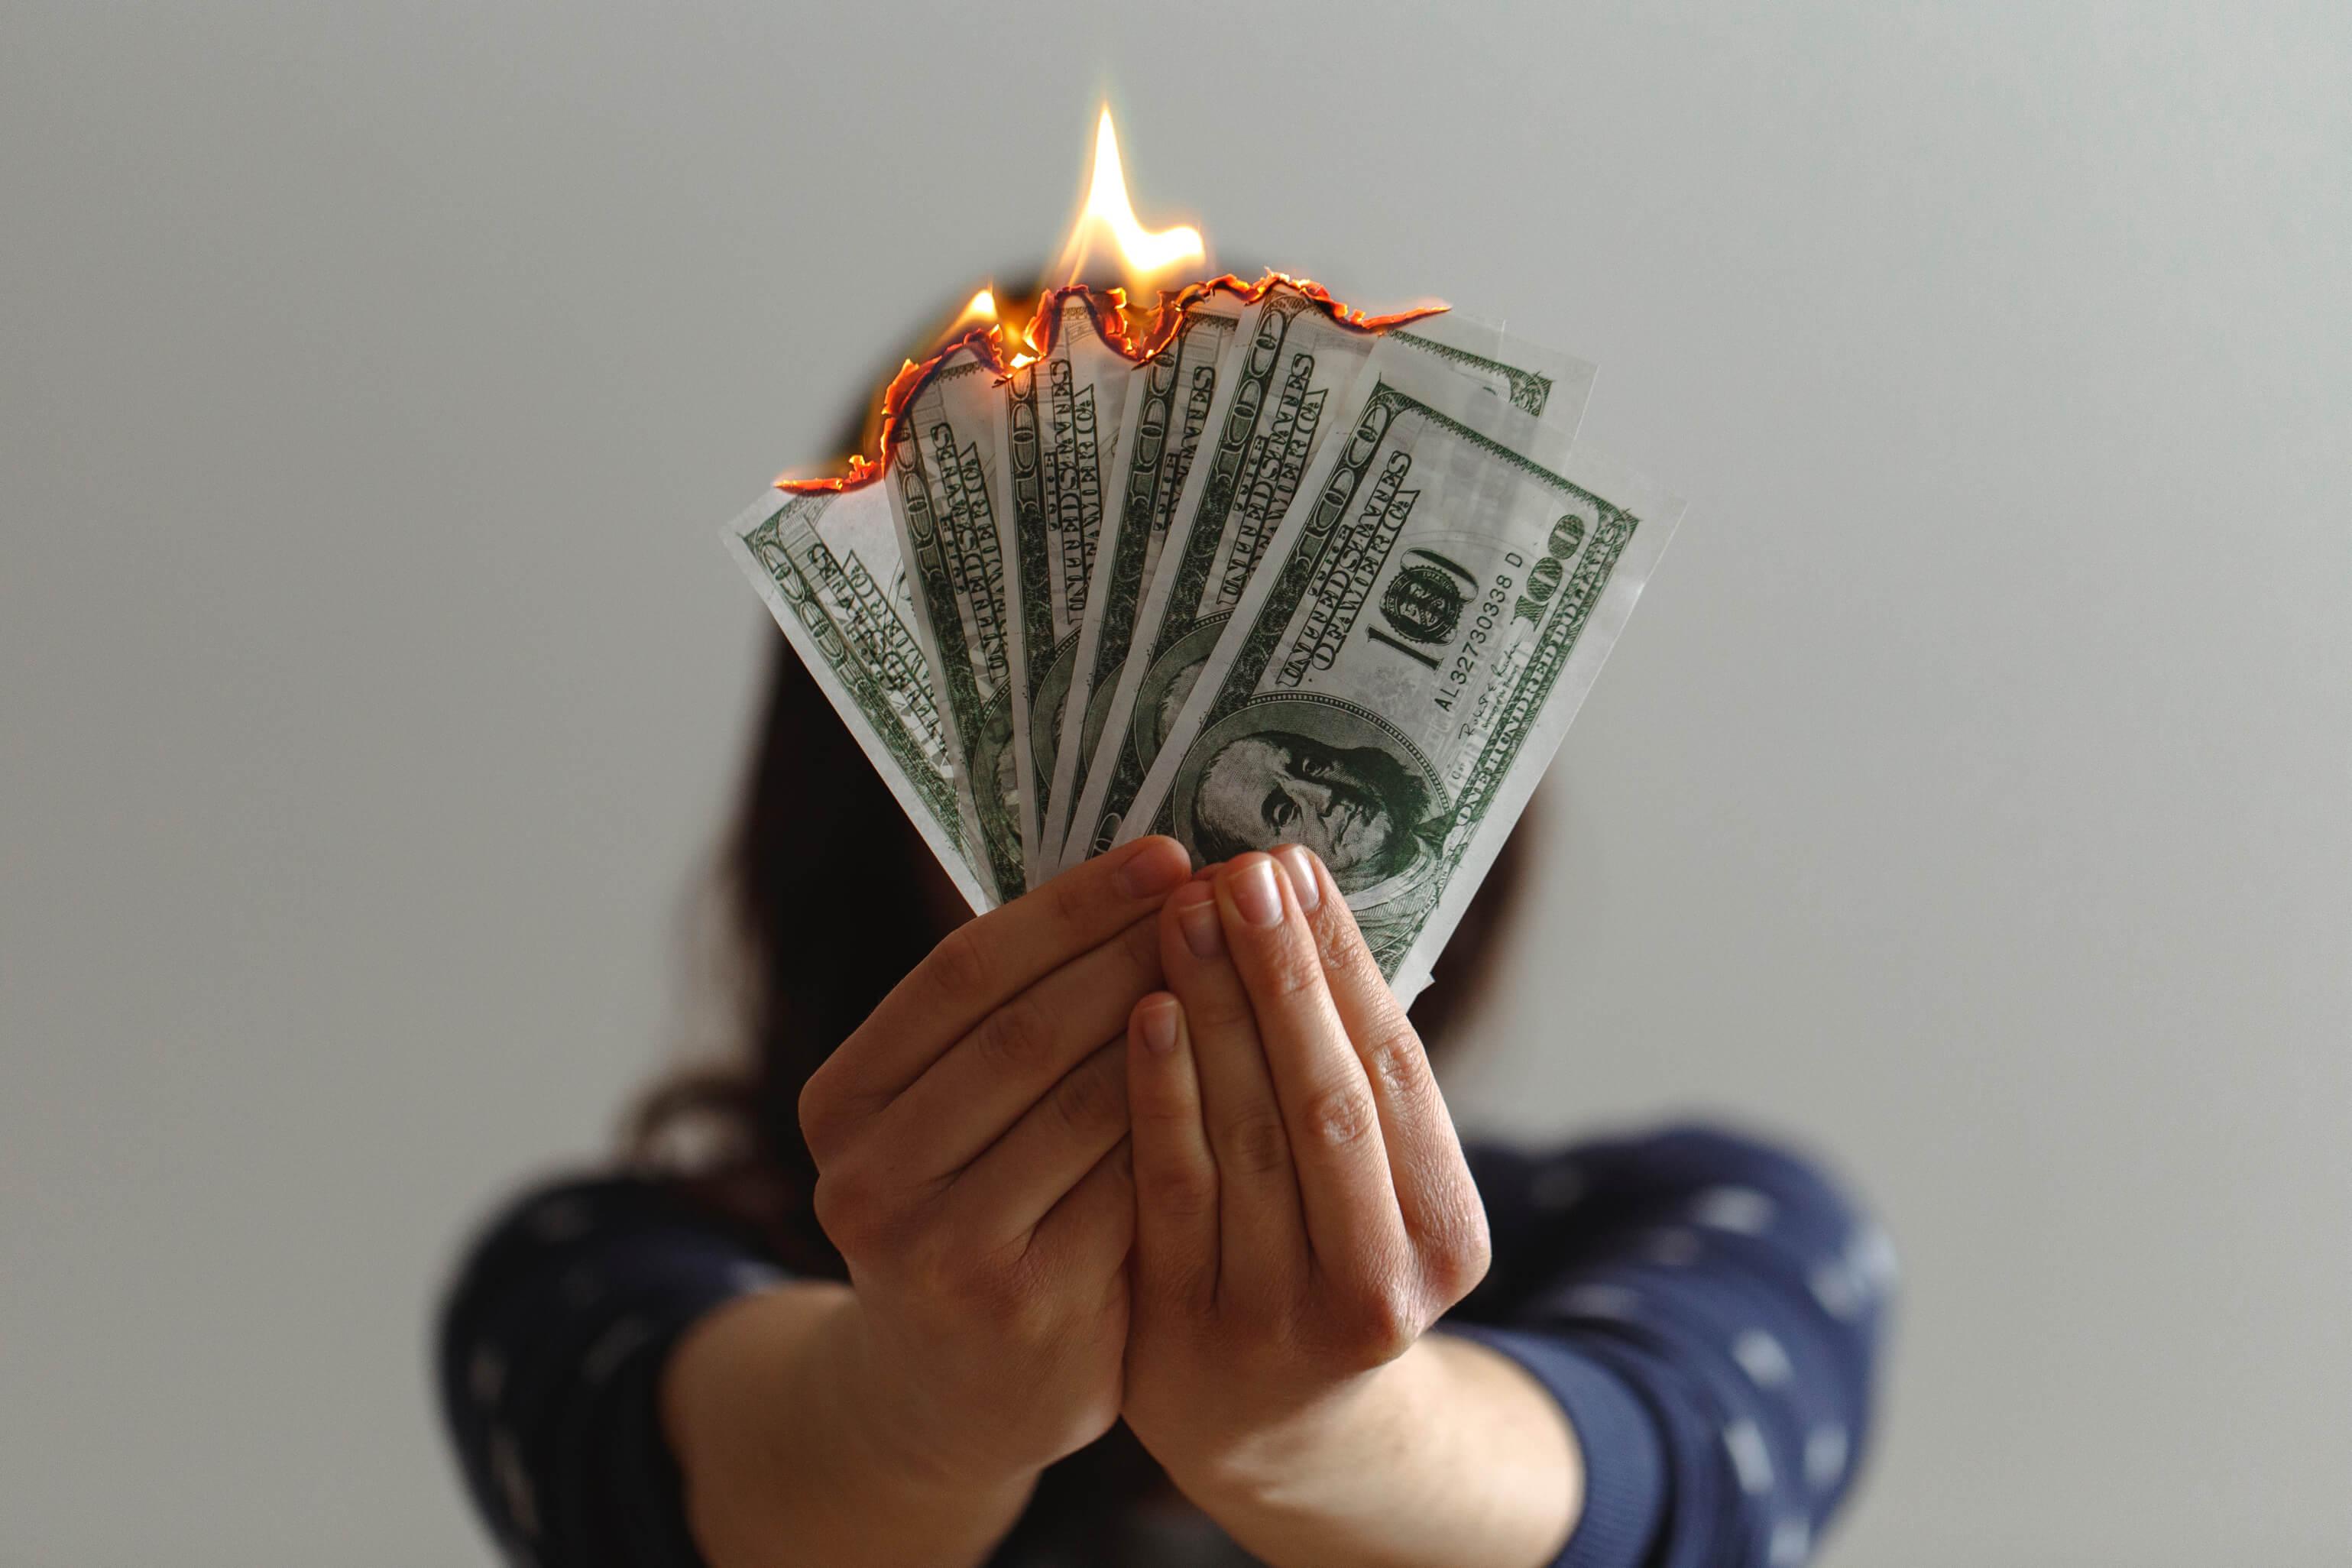 Imagen de persona quemando billetes